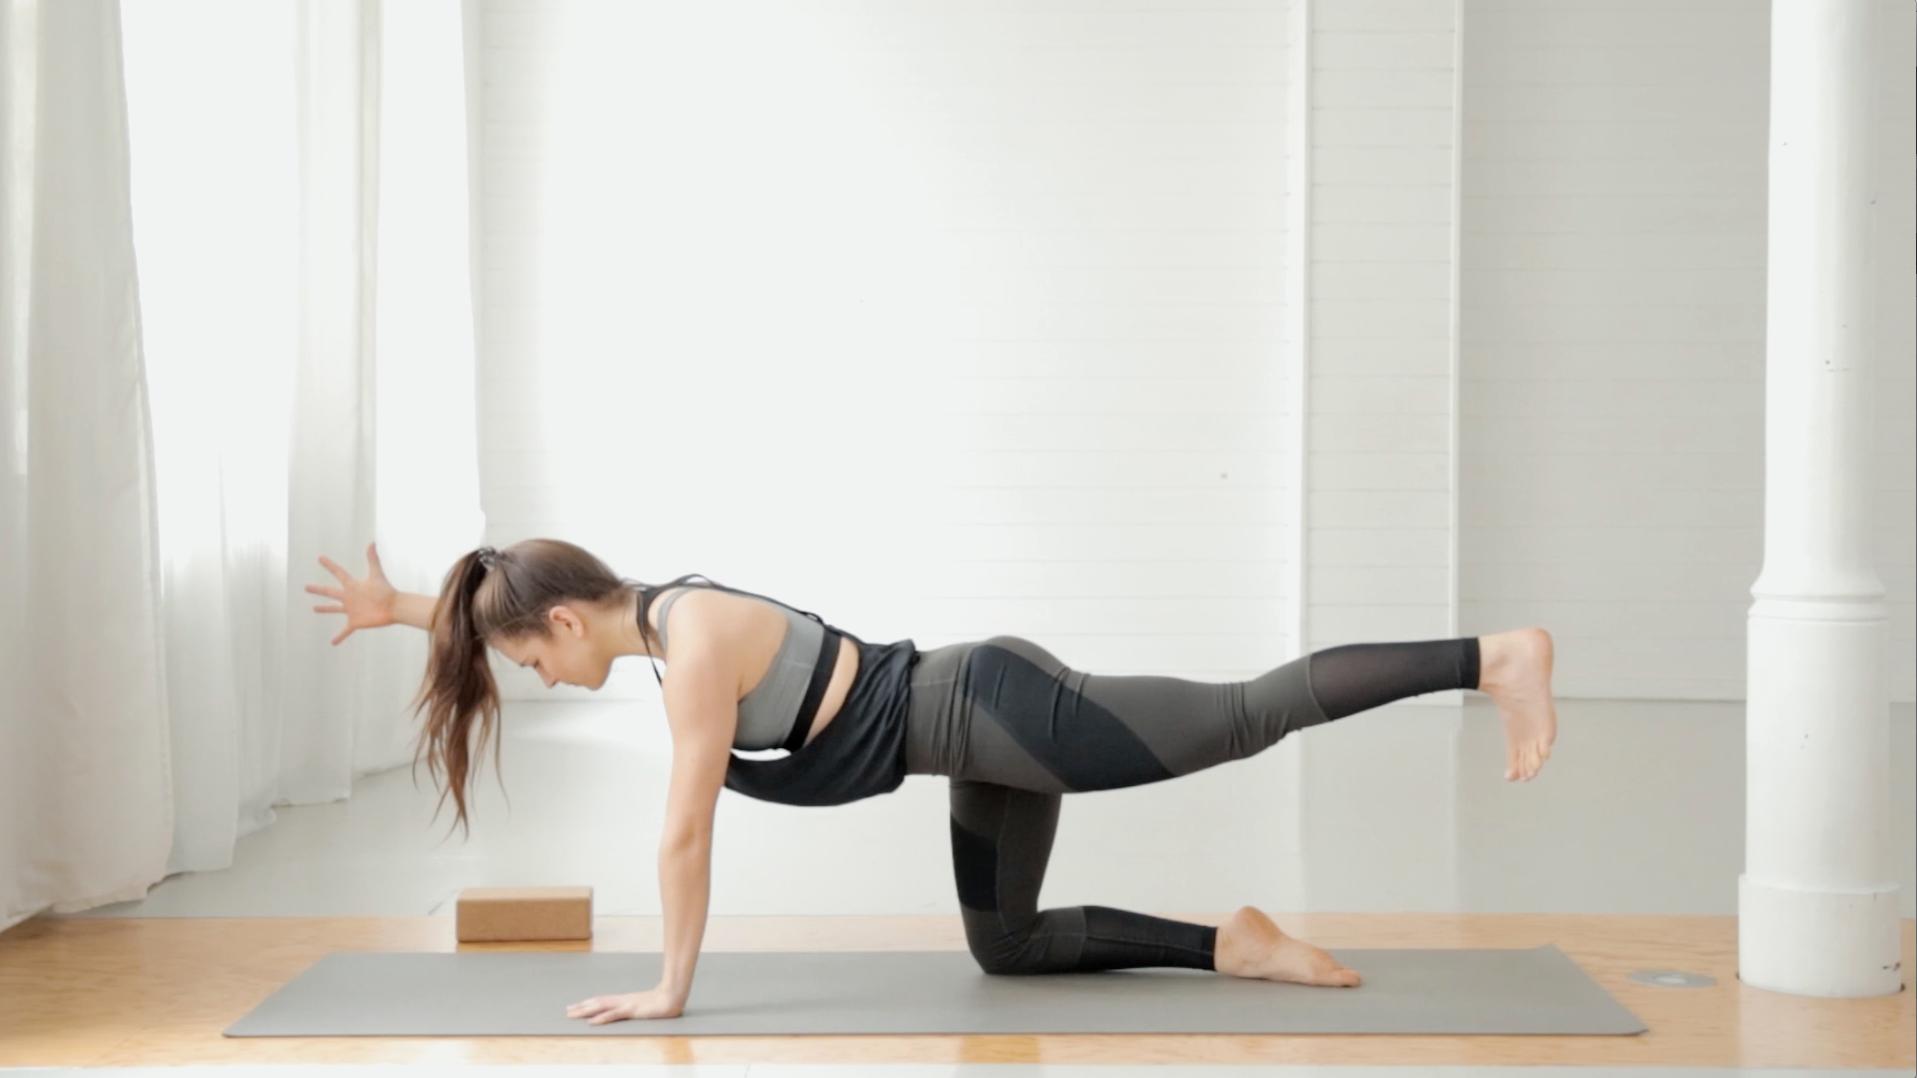 beine-po-booty-yoga-mady-morrison-04